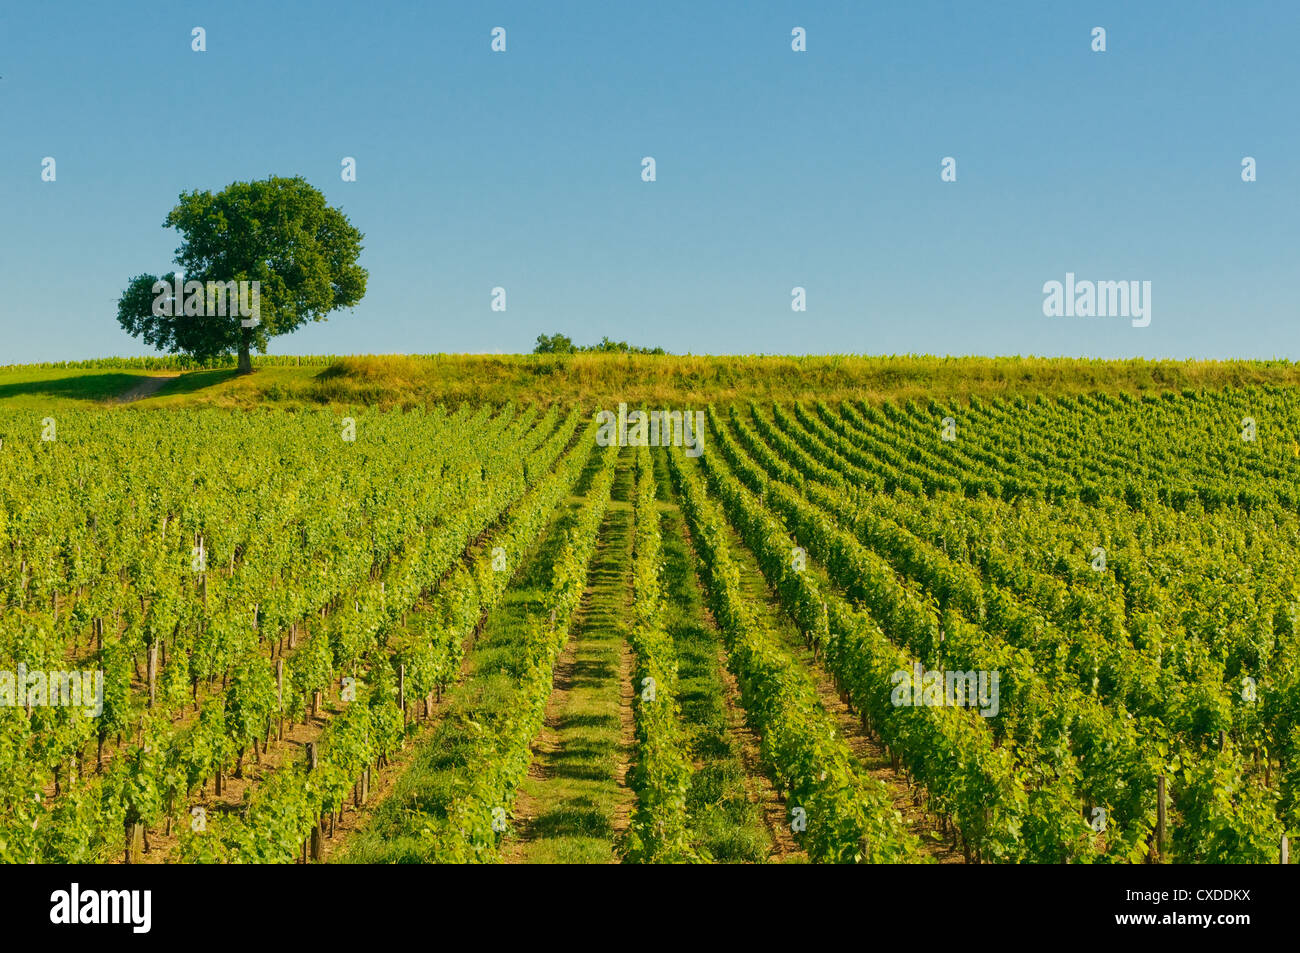 vineyards in bordeaux - Stock Image